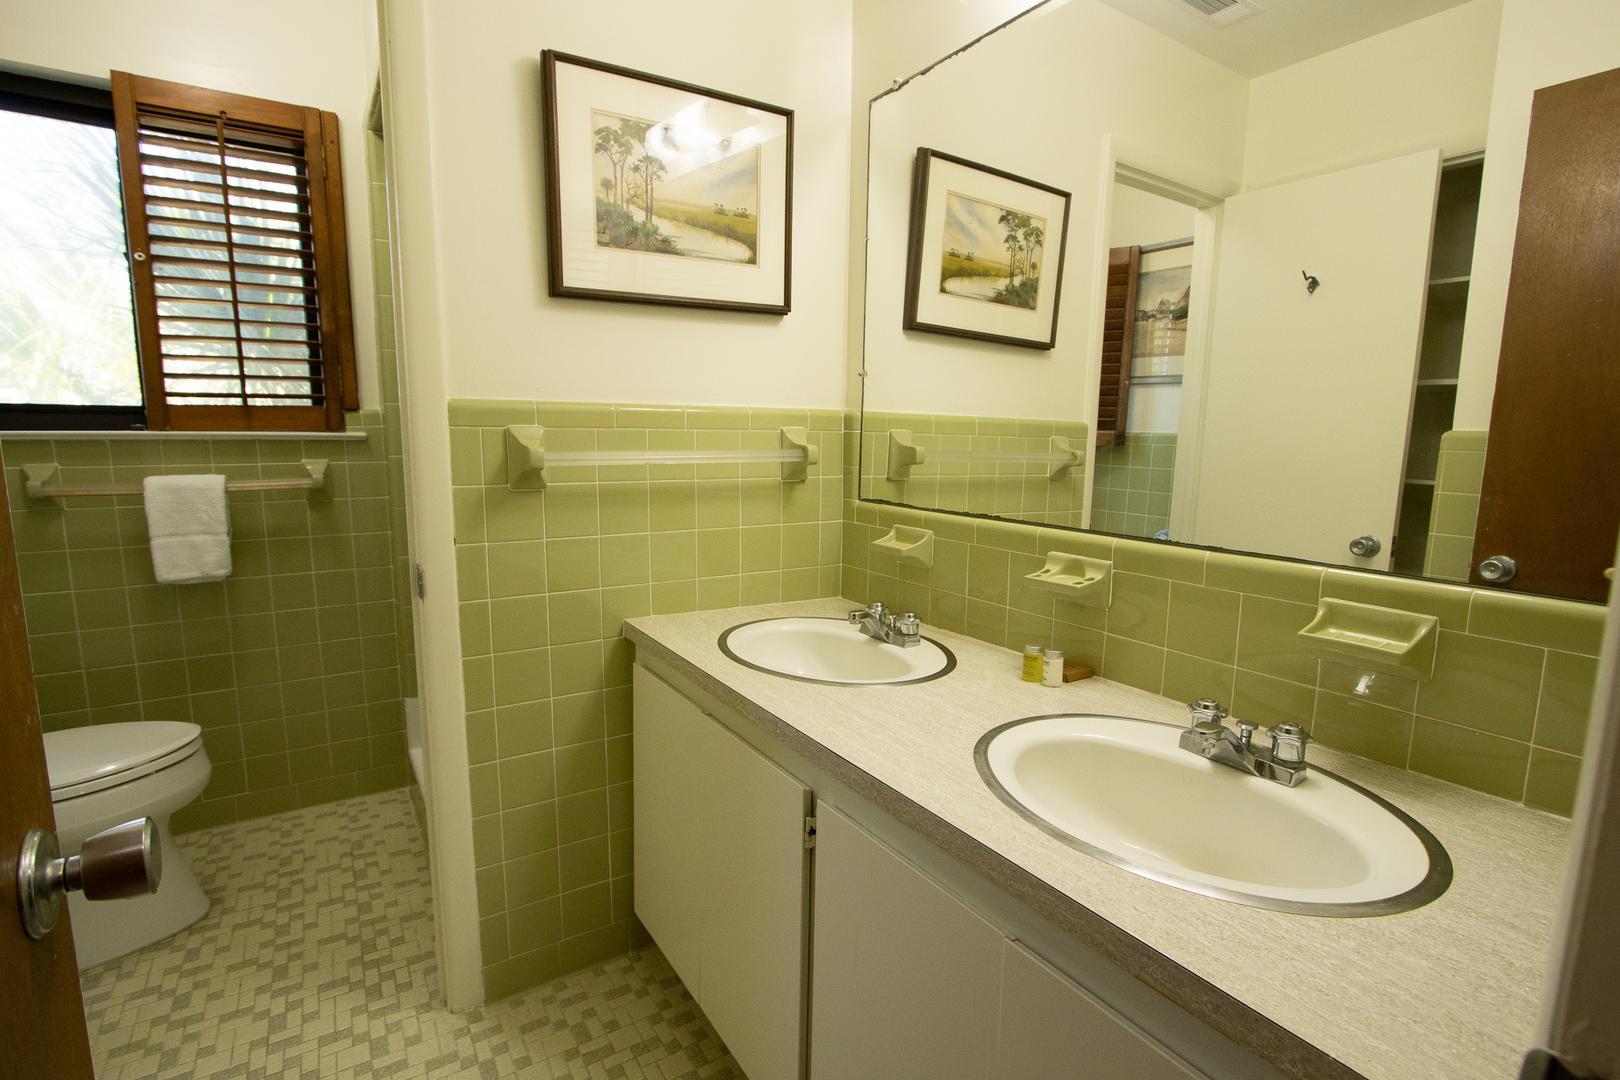 Bathroom next to master